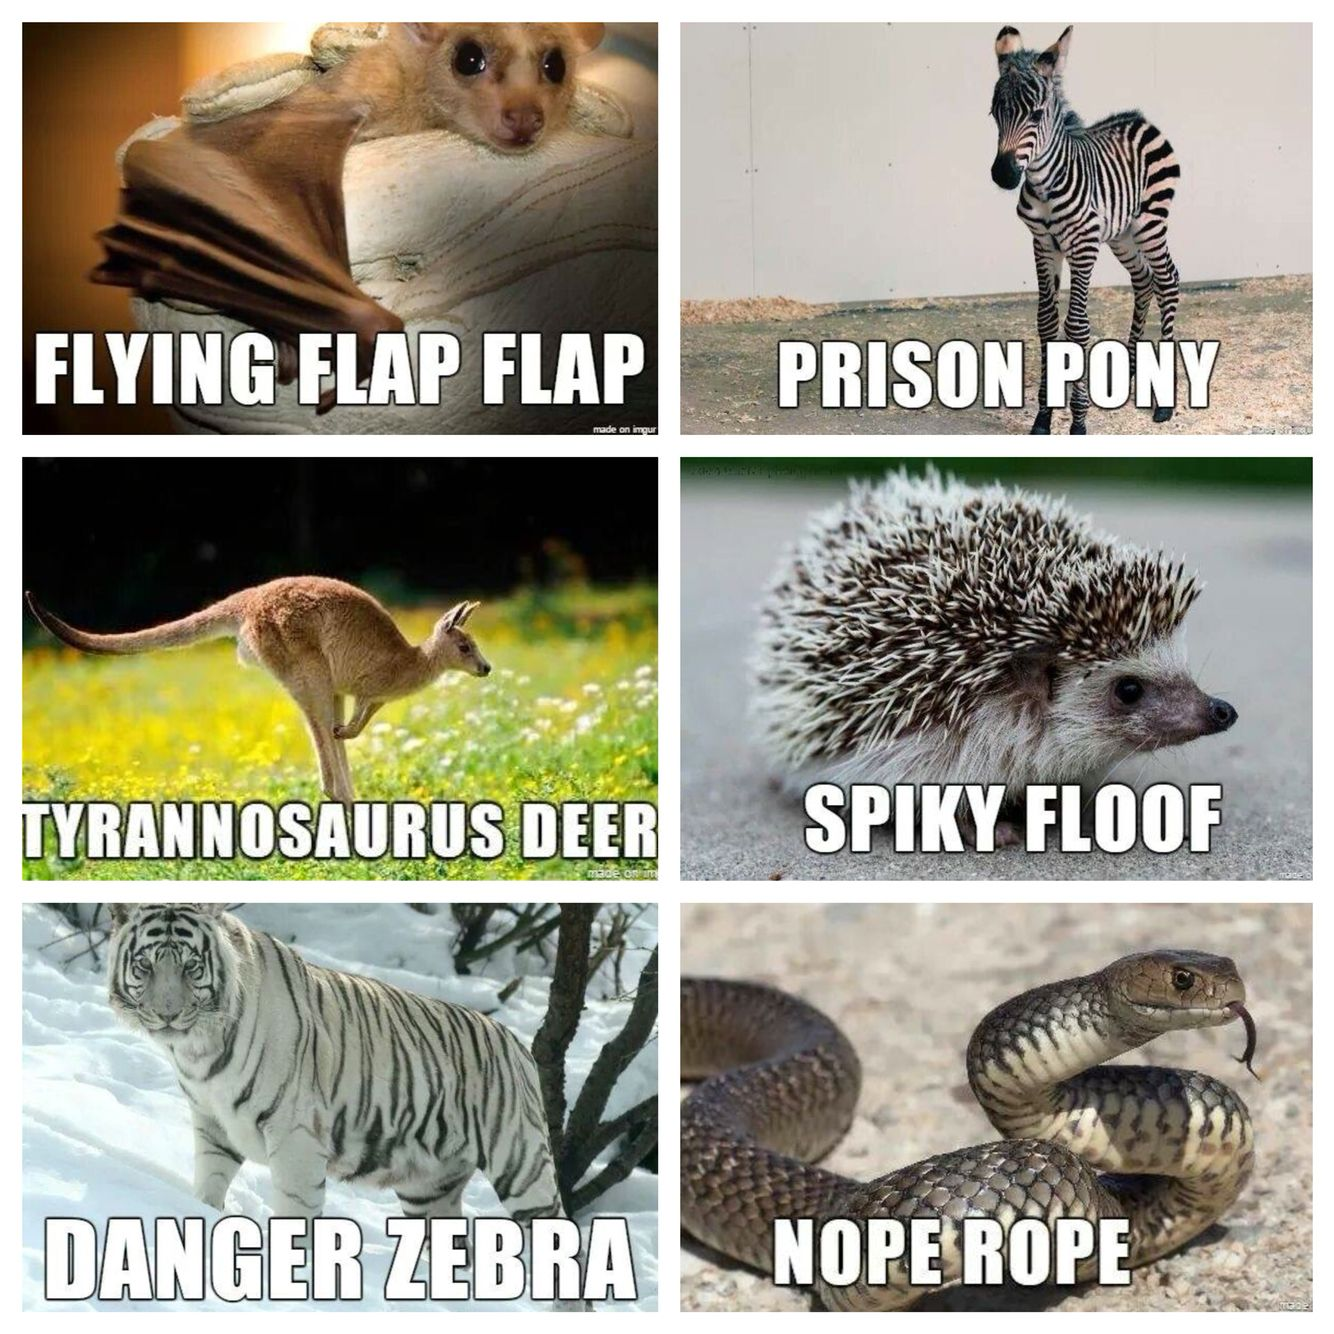 Renaming animals Funny animal jokes, Funny animal names